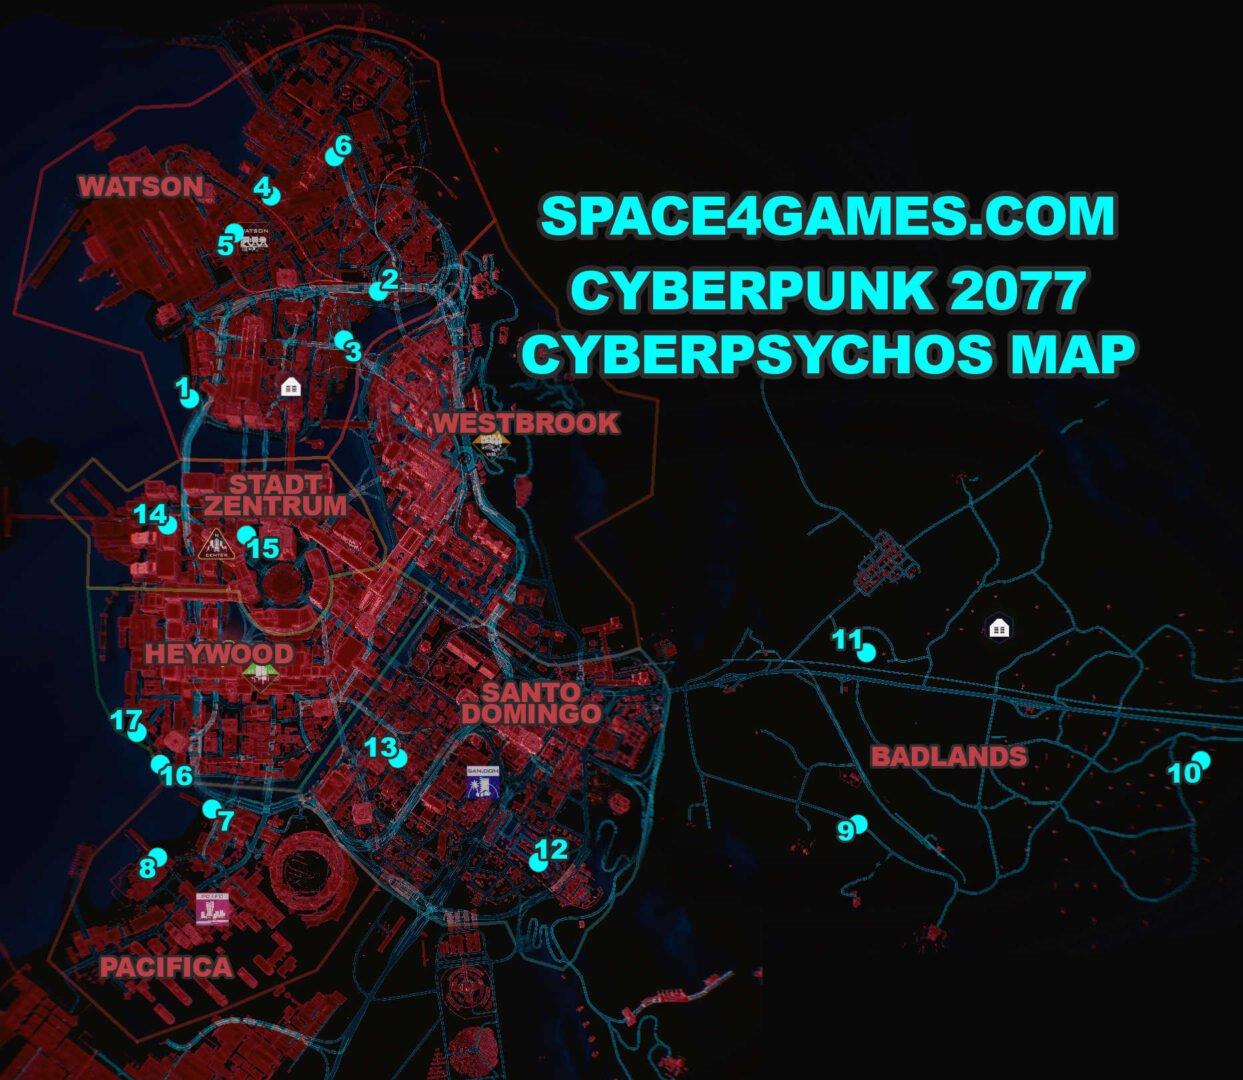 Cyberpunk 2077 Cyberpsycho-Guide Standorte aller Cyberpsychos Karte